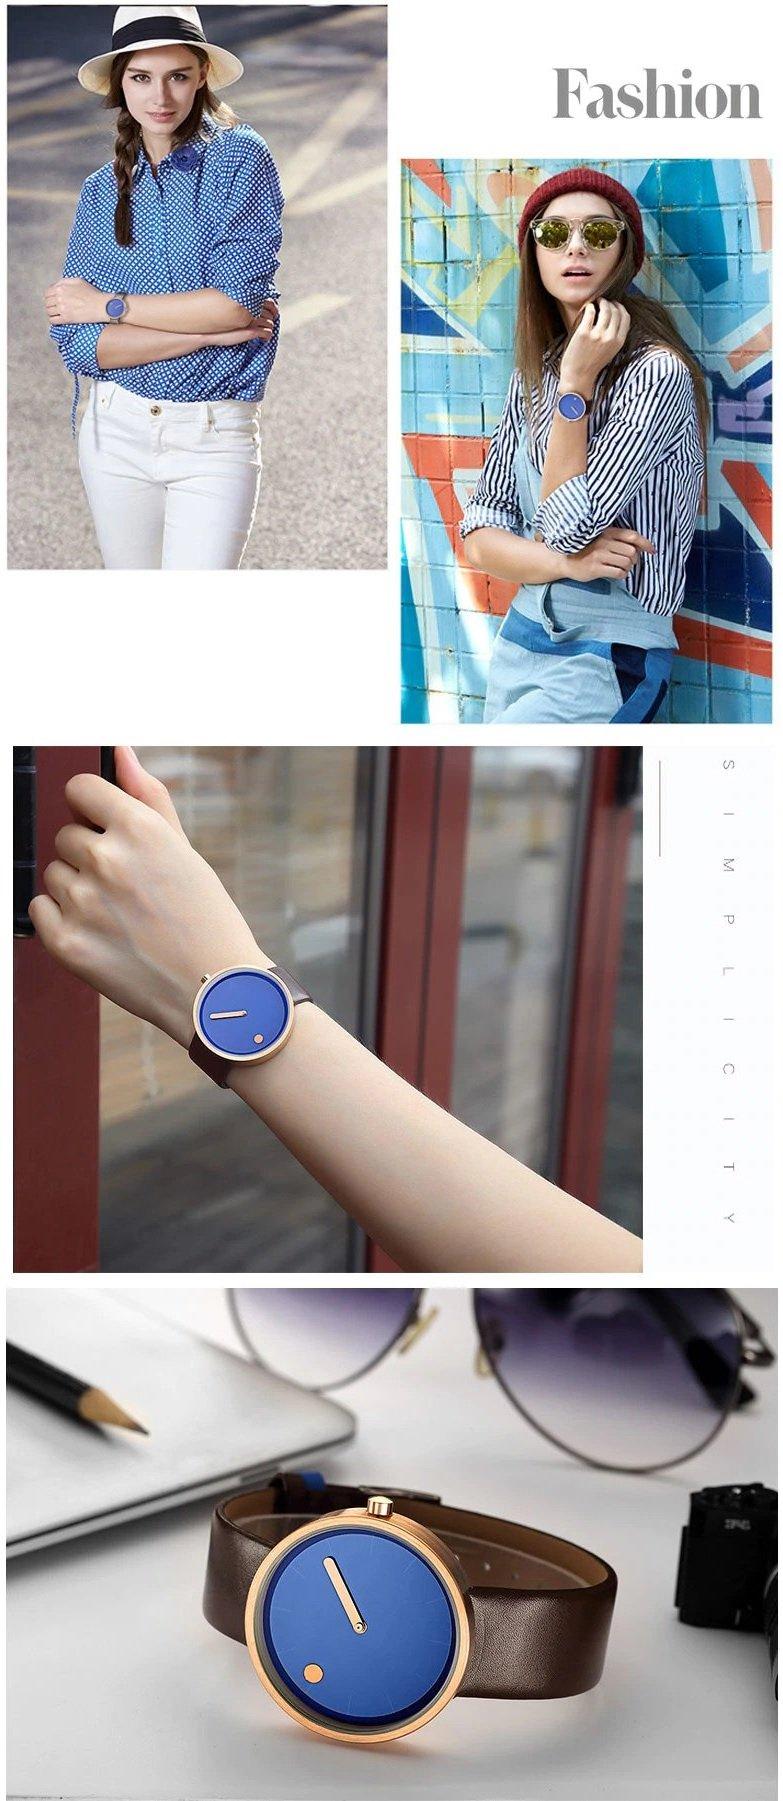 Zegarek Geekthink Fashion niebieski 11